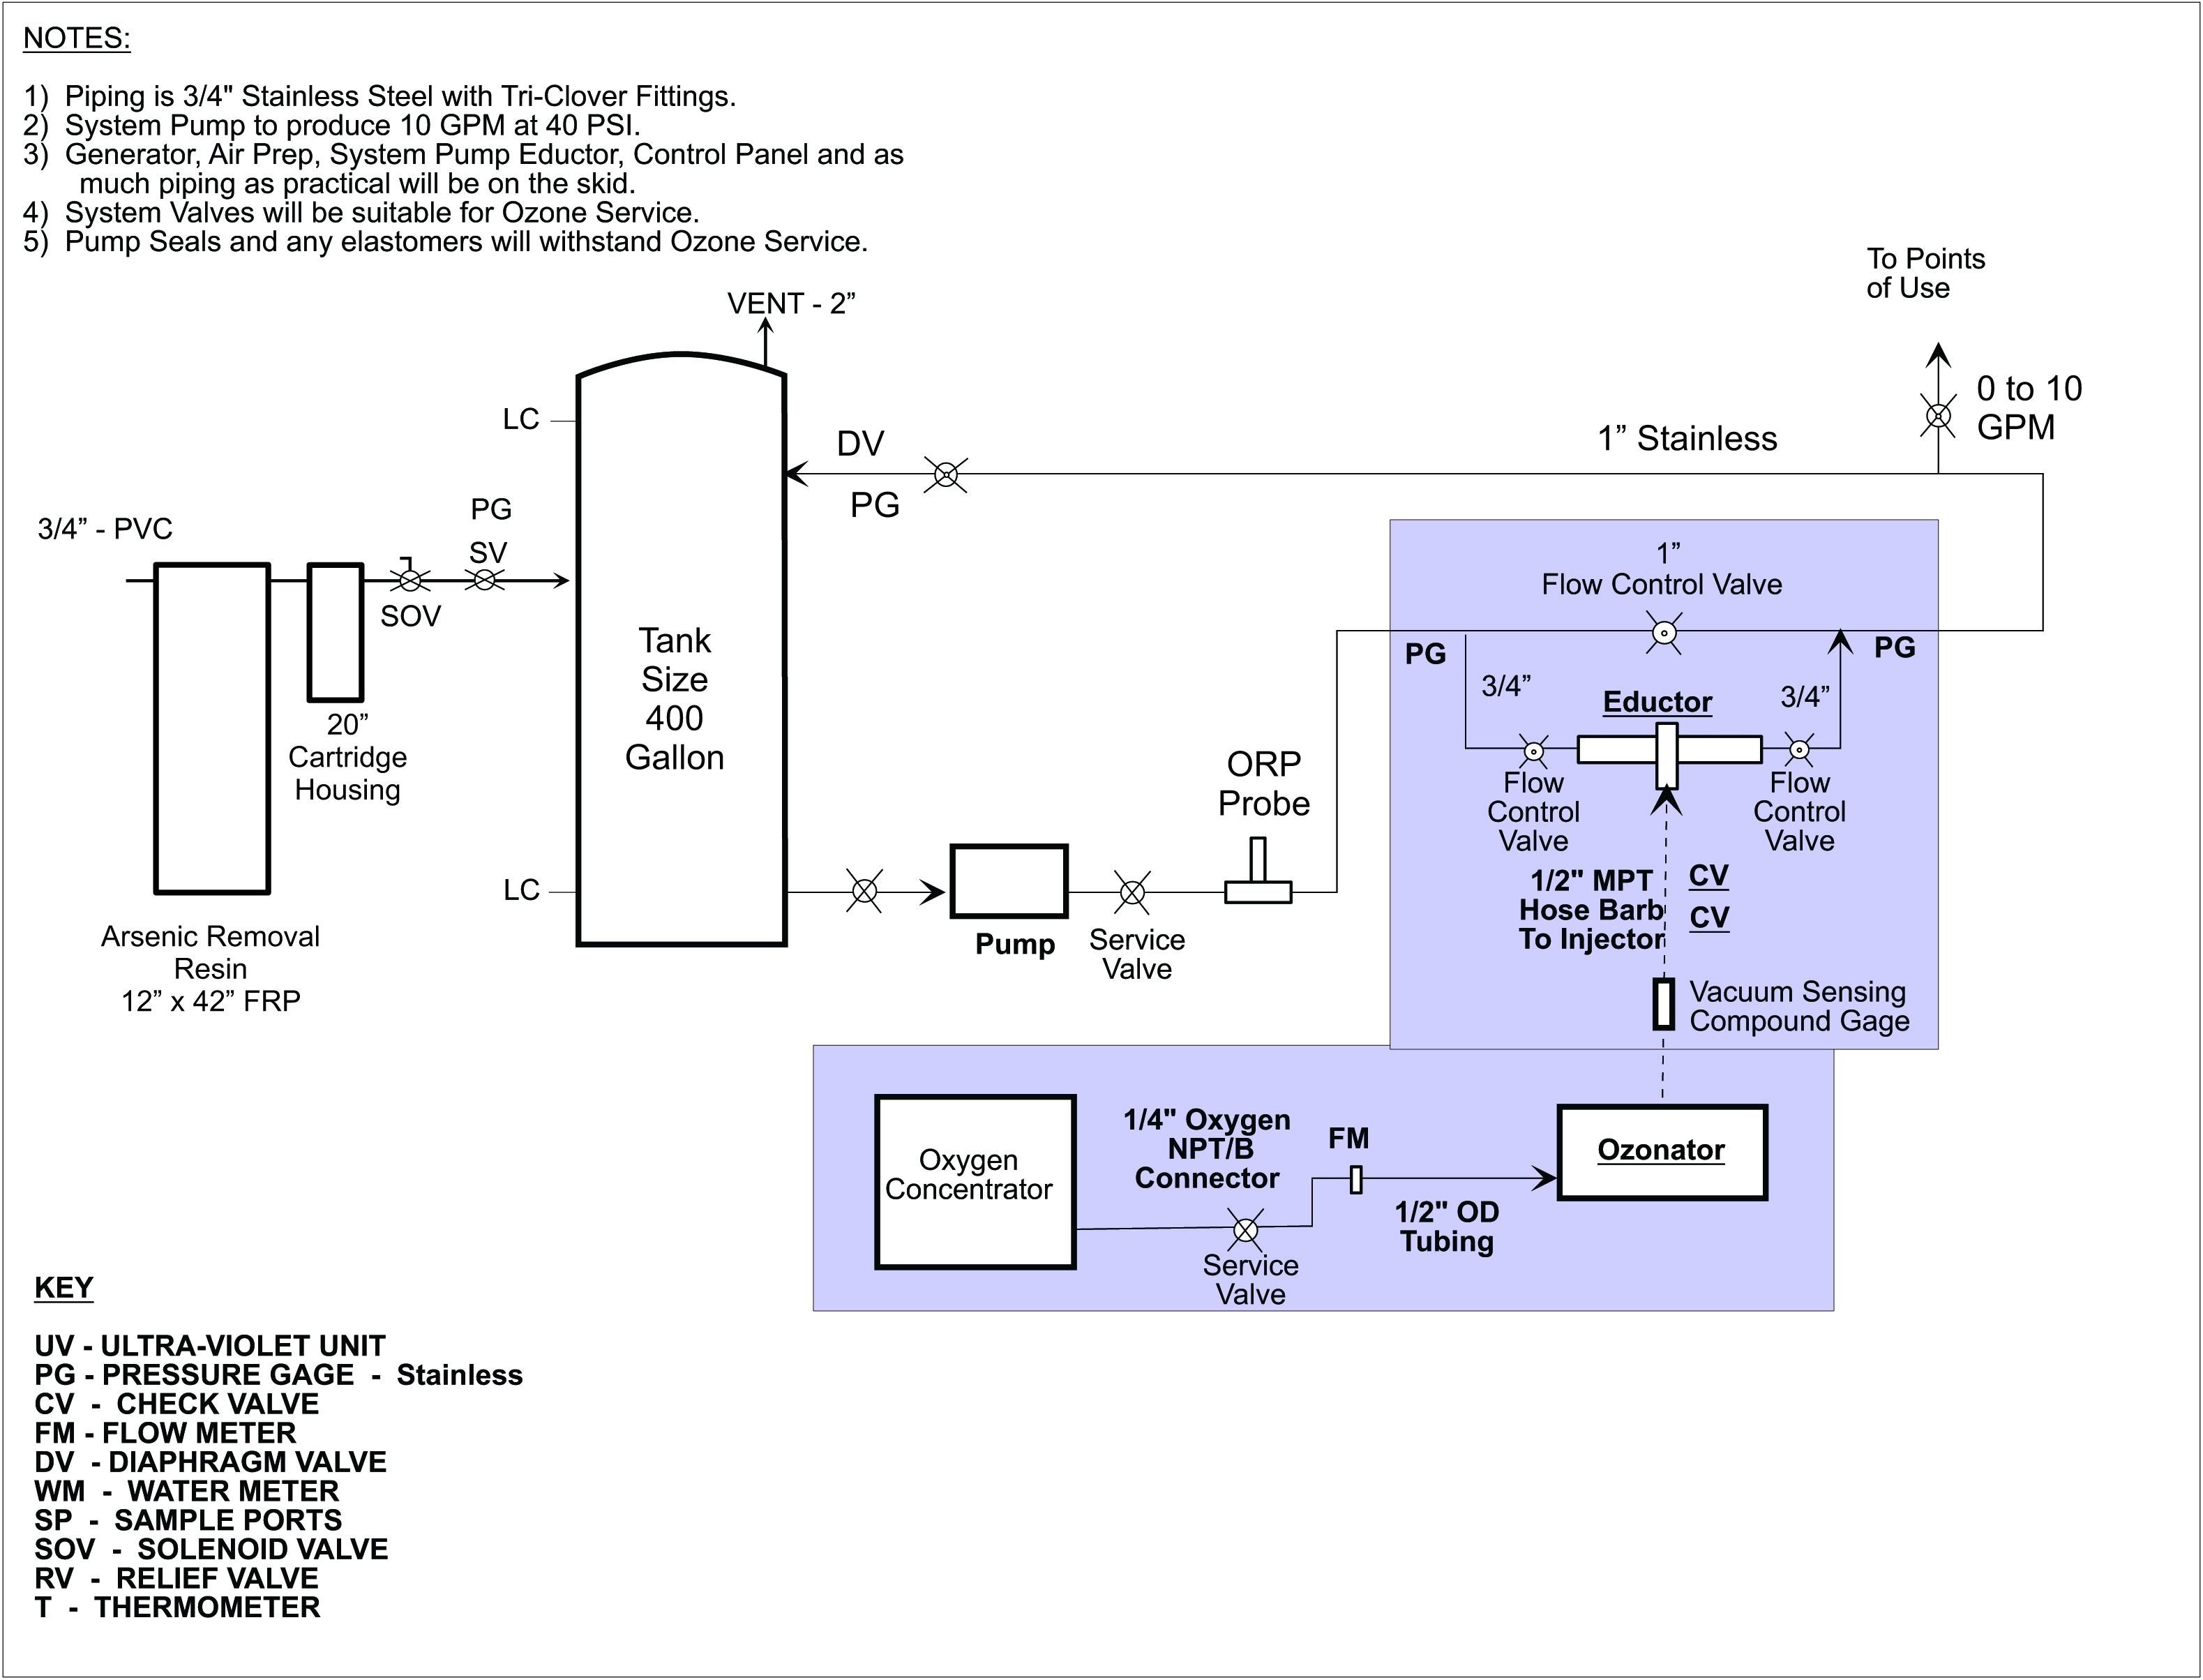 or not gate circuit basiccircuit circuit diagram seekiccom blog transistor nor gate circuit diagram basiccircuit circuit